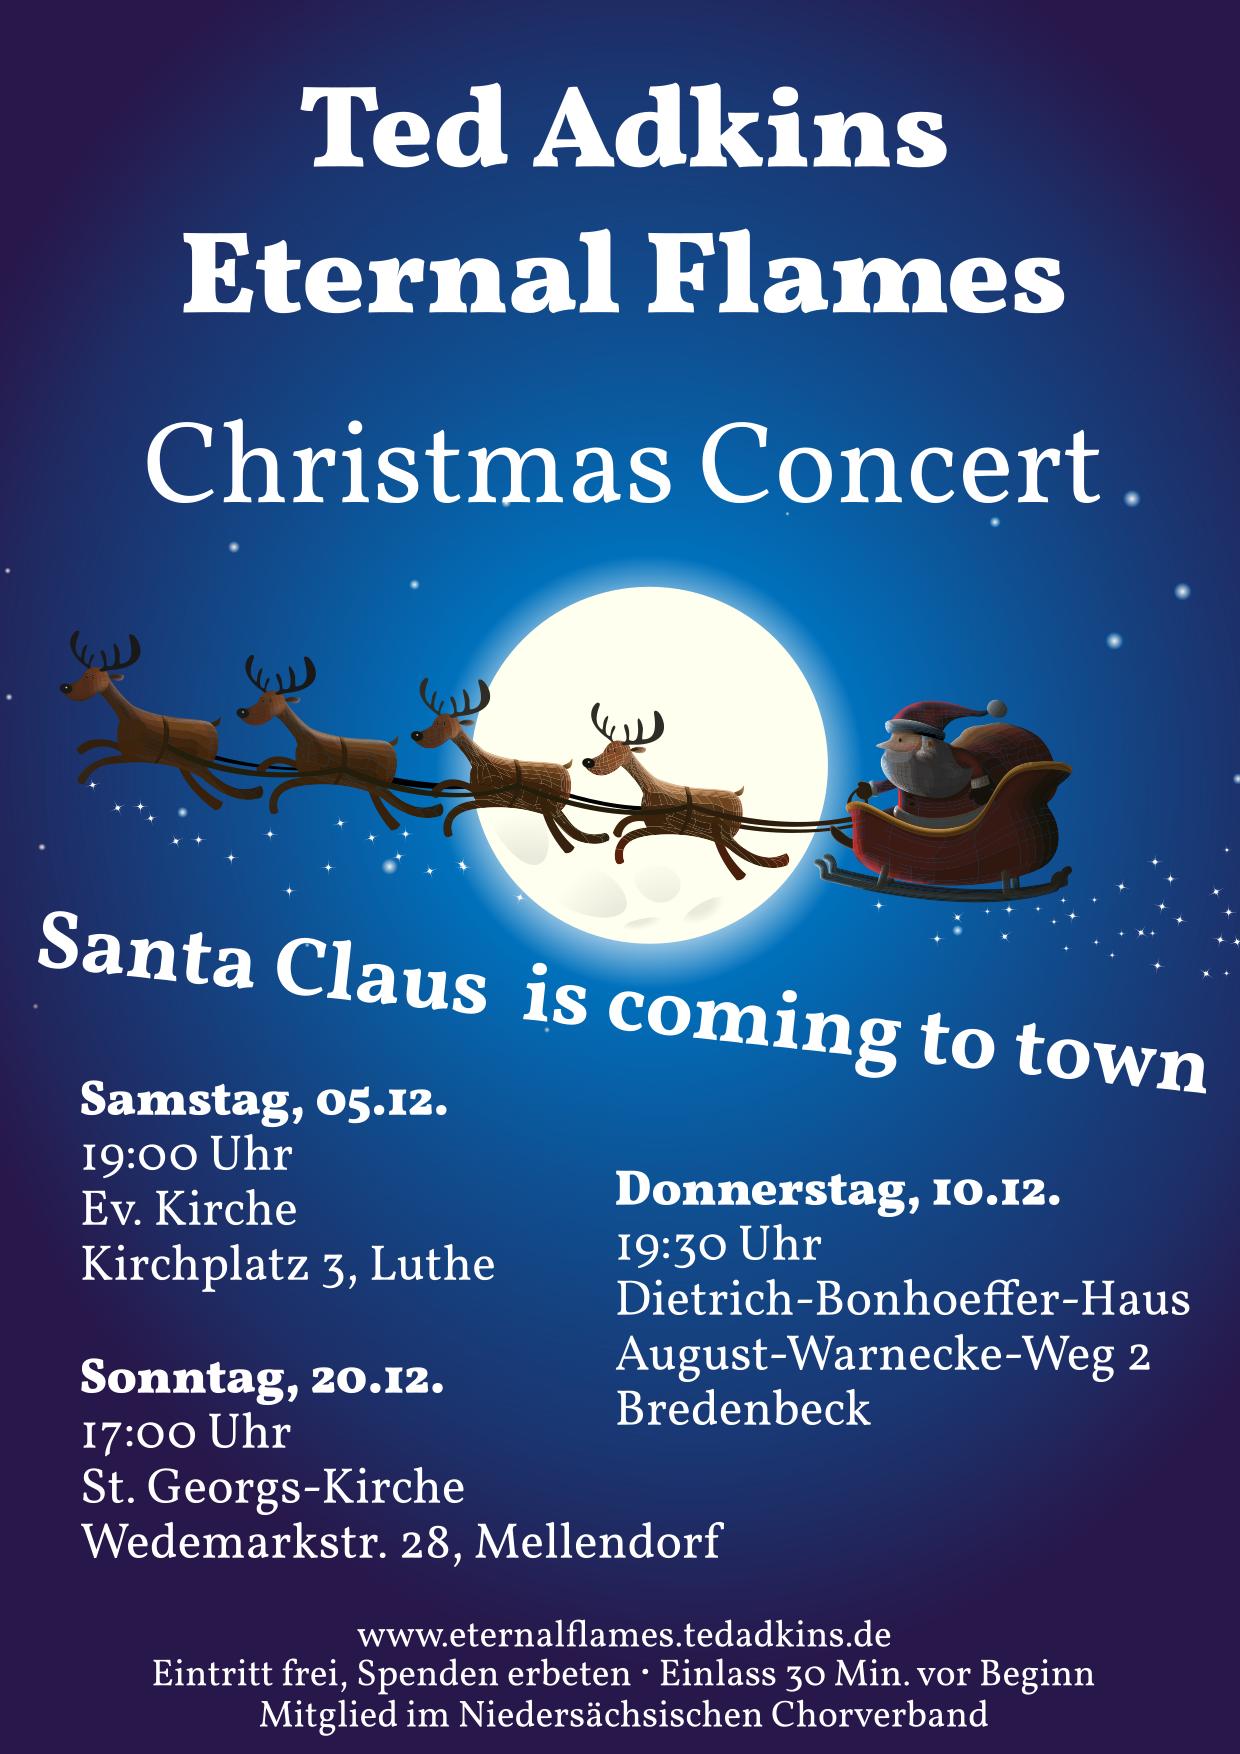 Santa Claus comes to Mellendorf